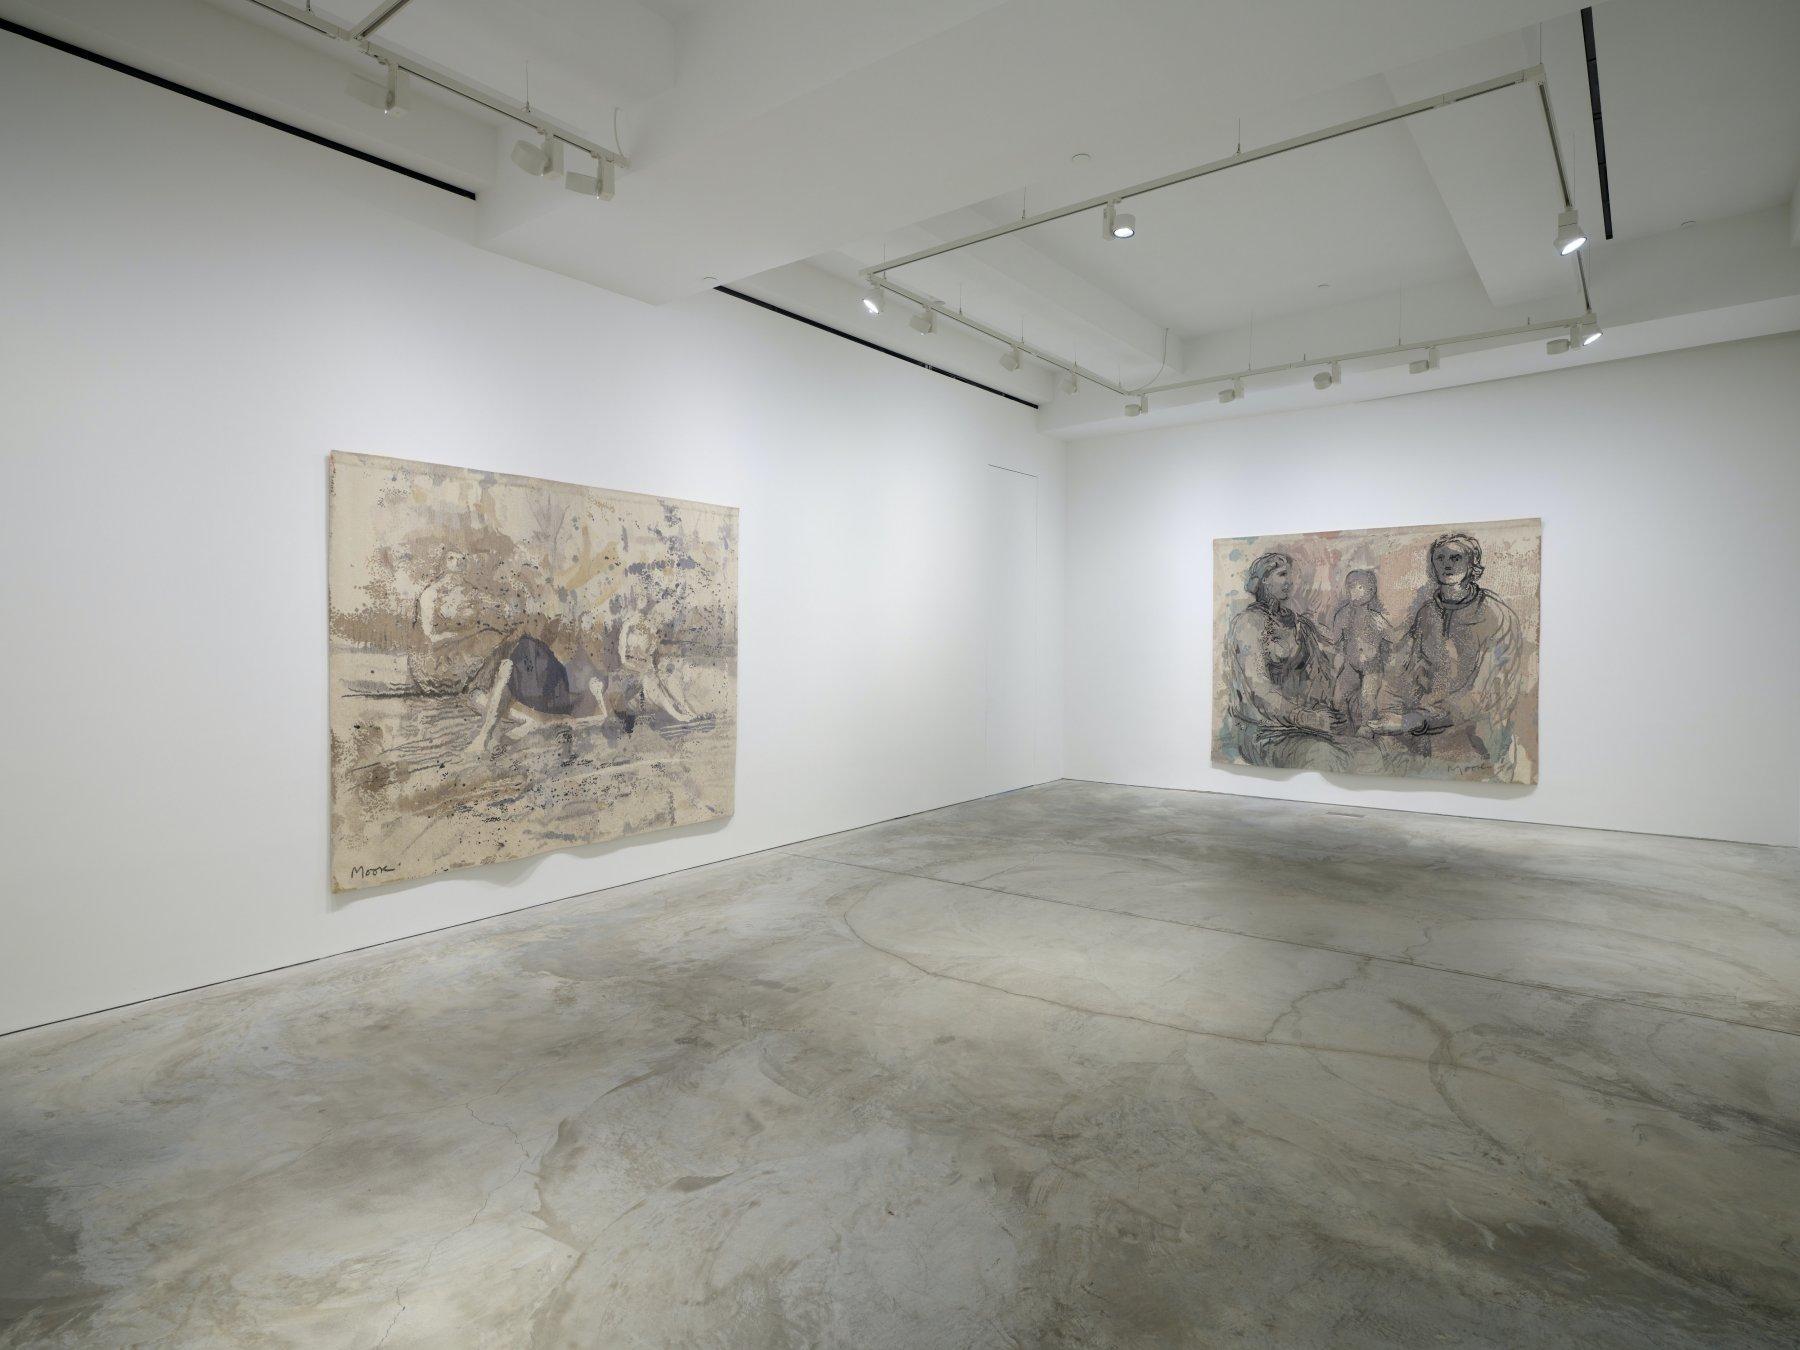 Hauser Wirth Hong Kong Henry Moore 1